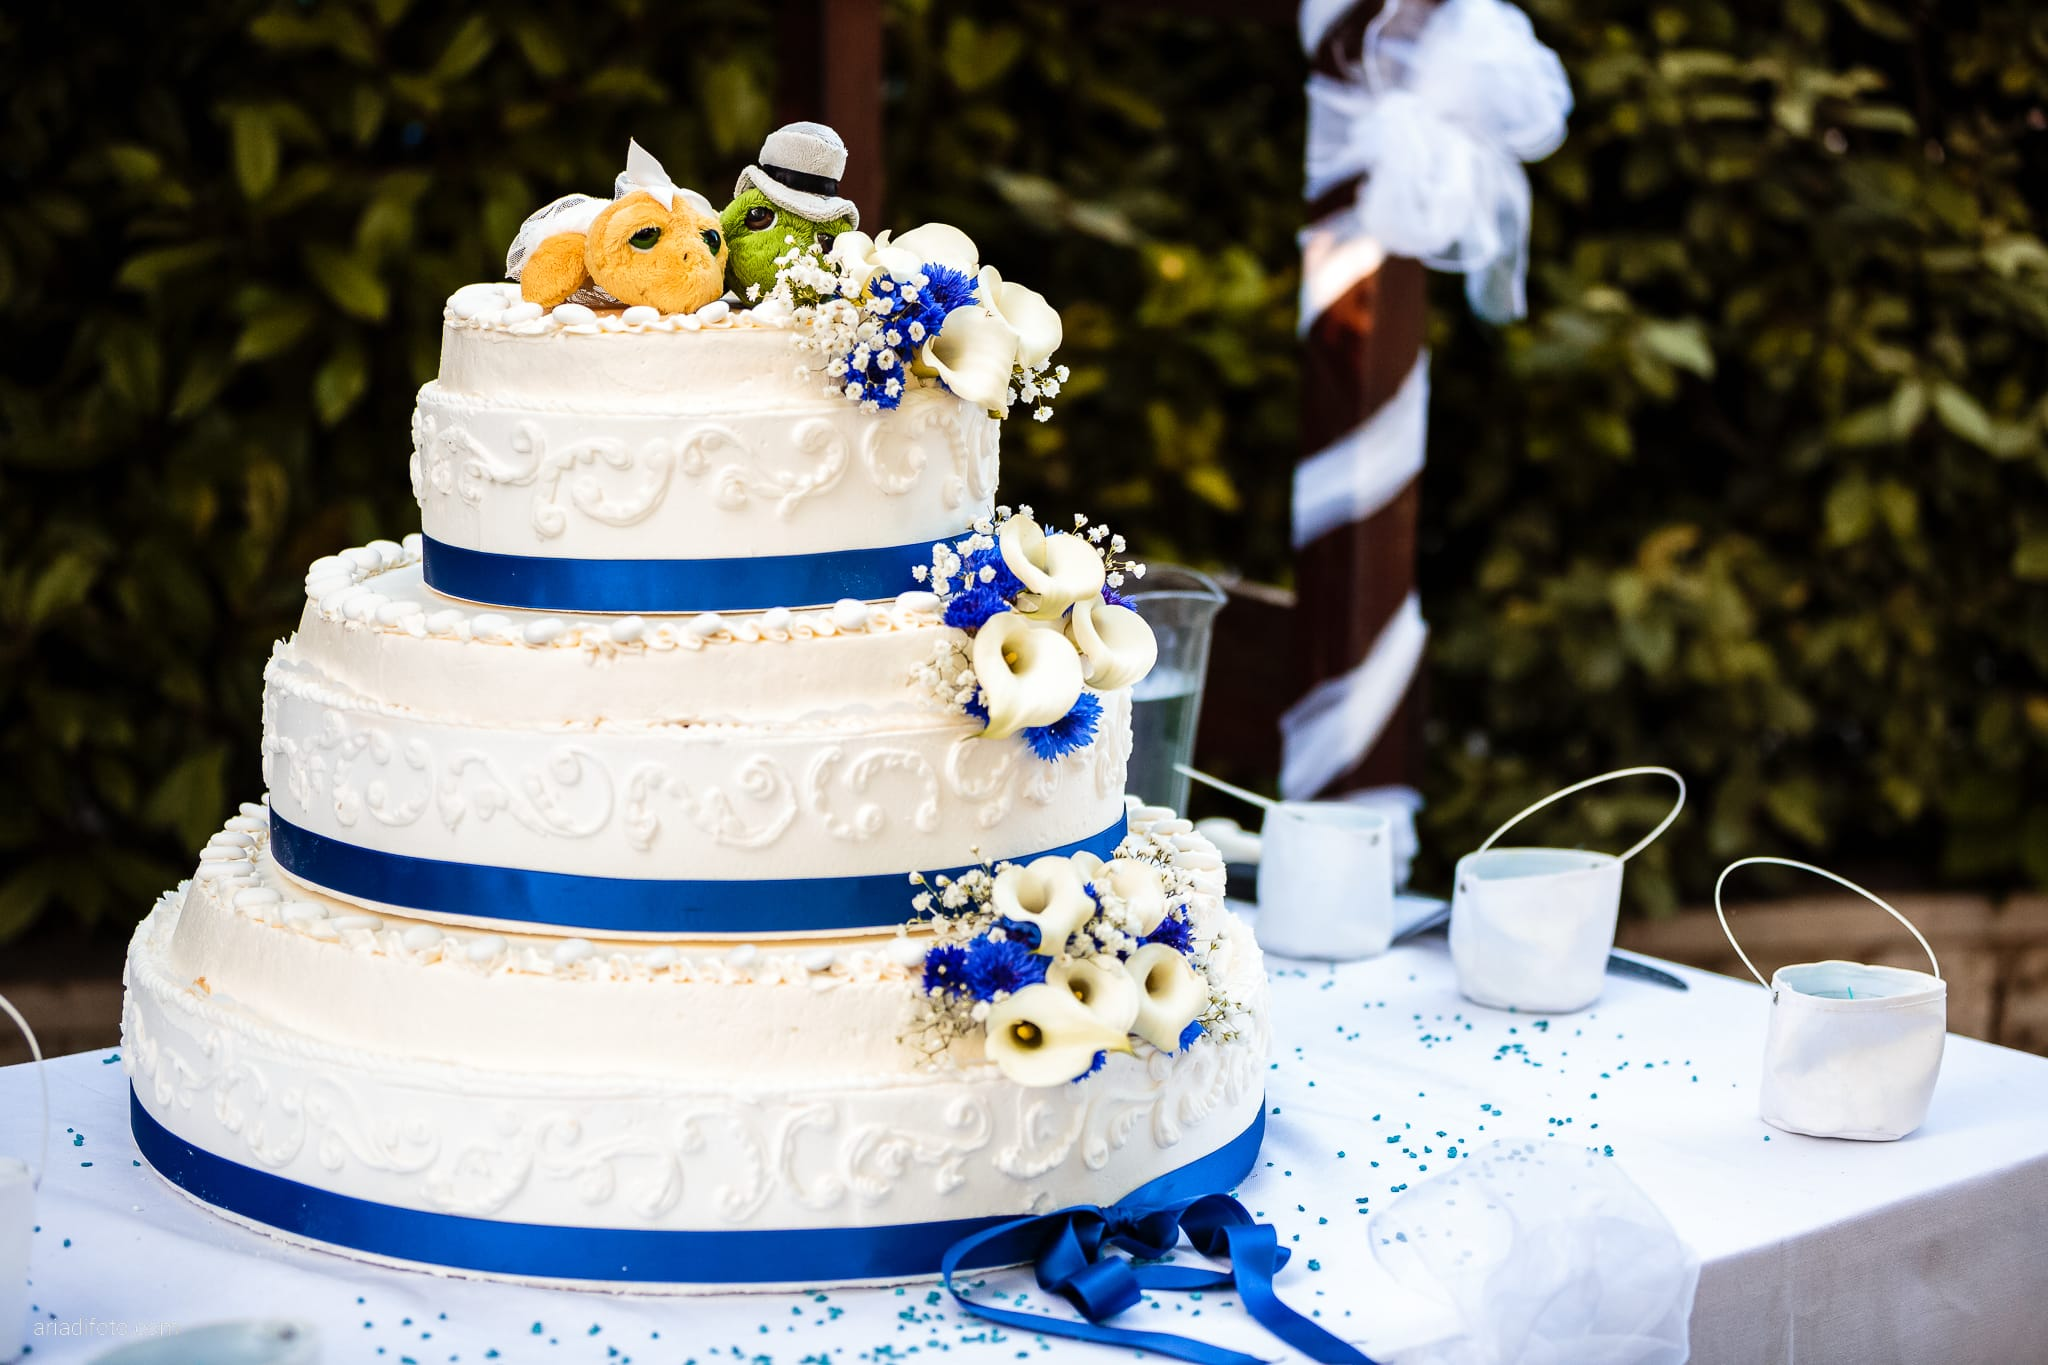 Fiordaliso Andrea matrimonio Salvia Rosmarino Trieste ricevimento torta